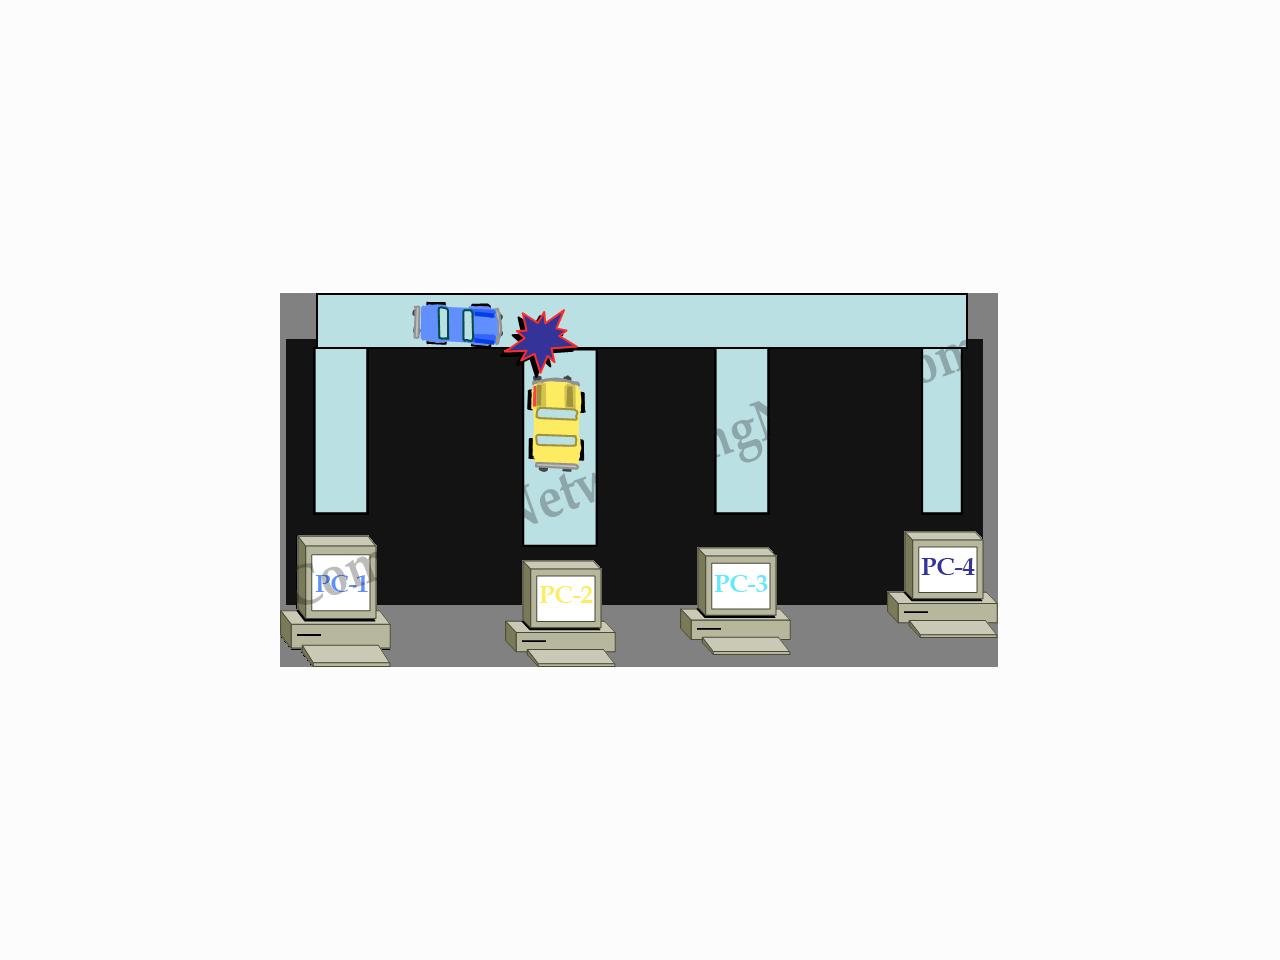 hight resolution of network wiring b standard